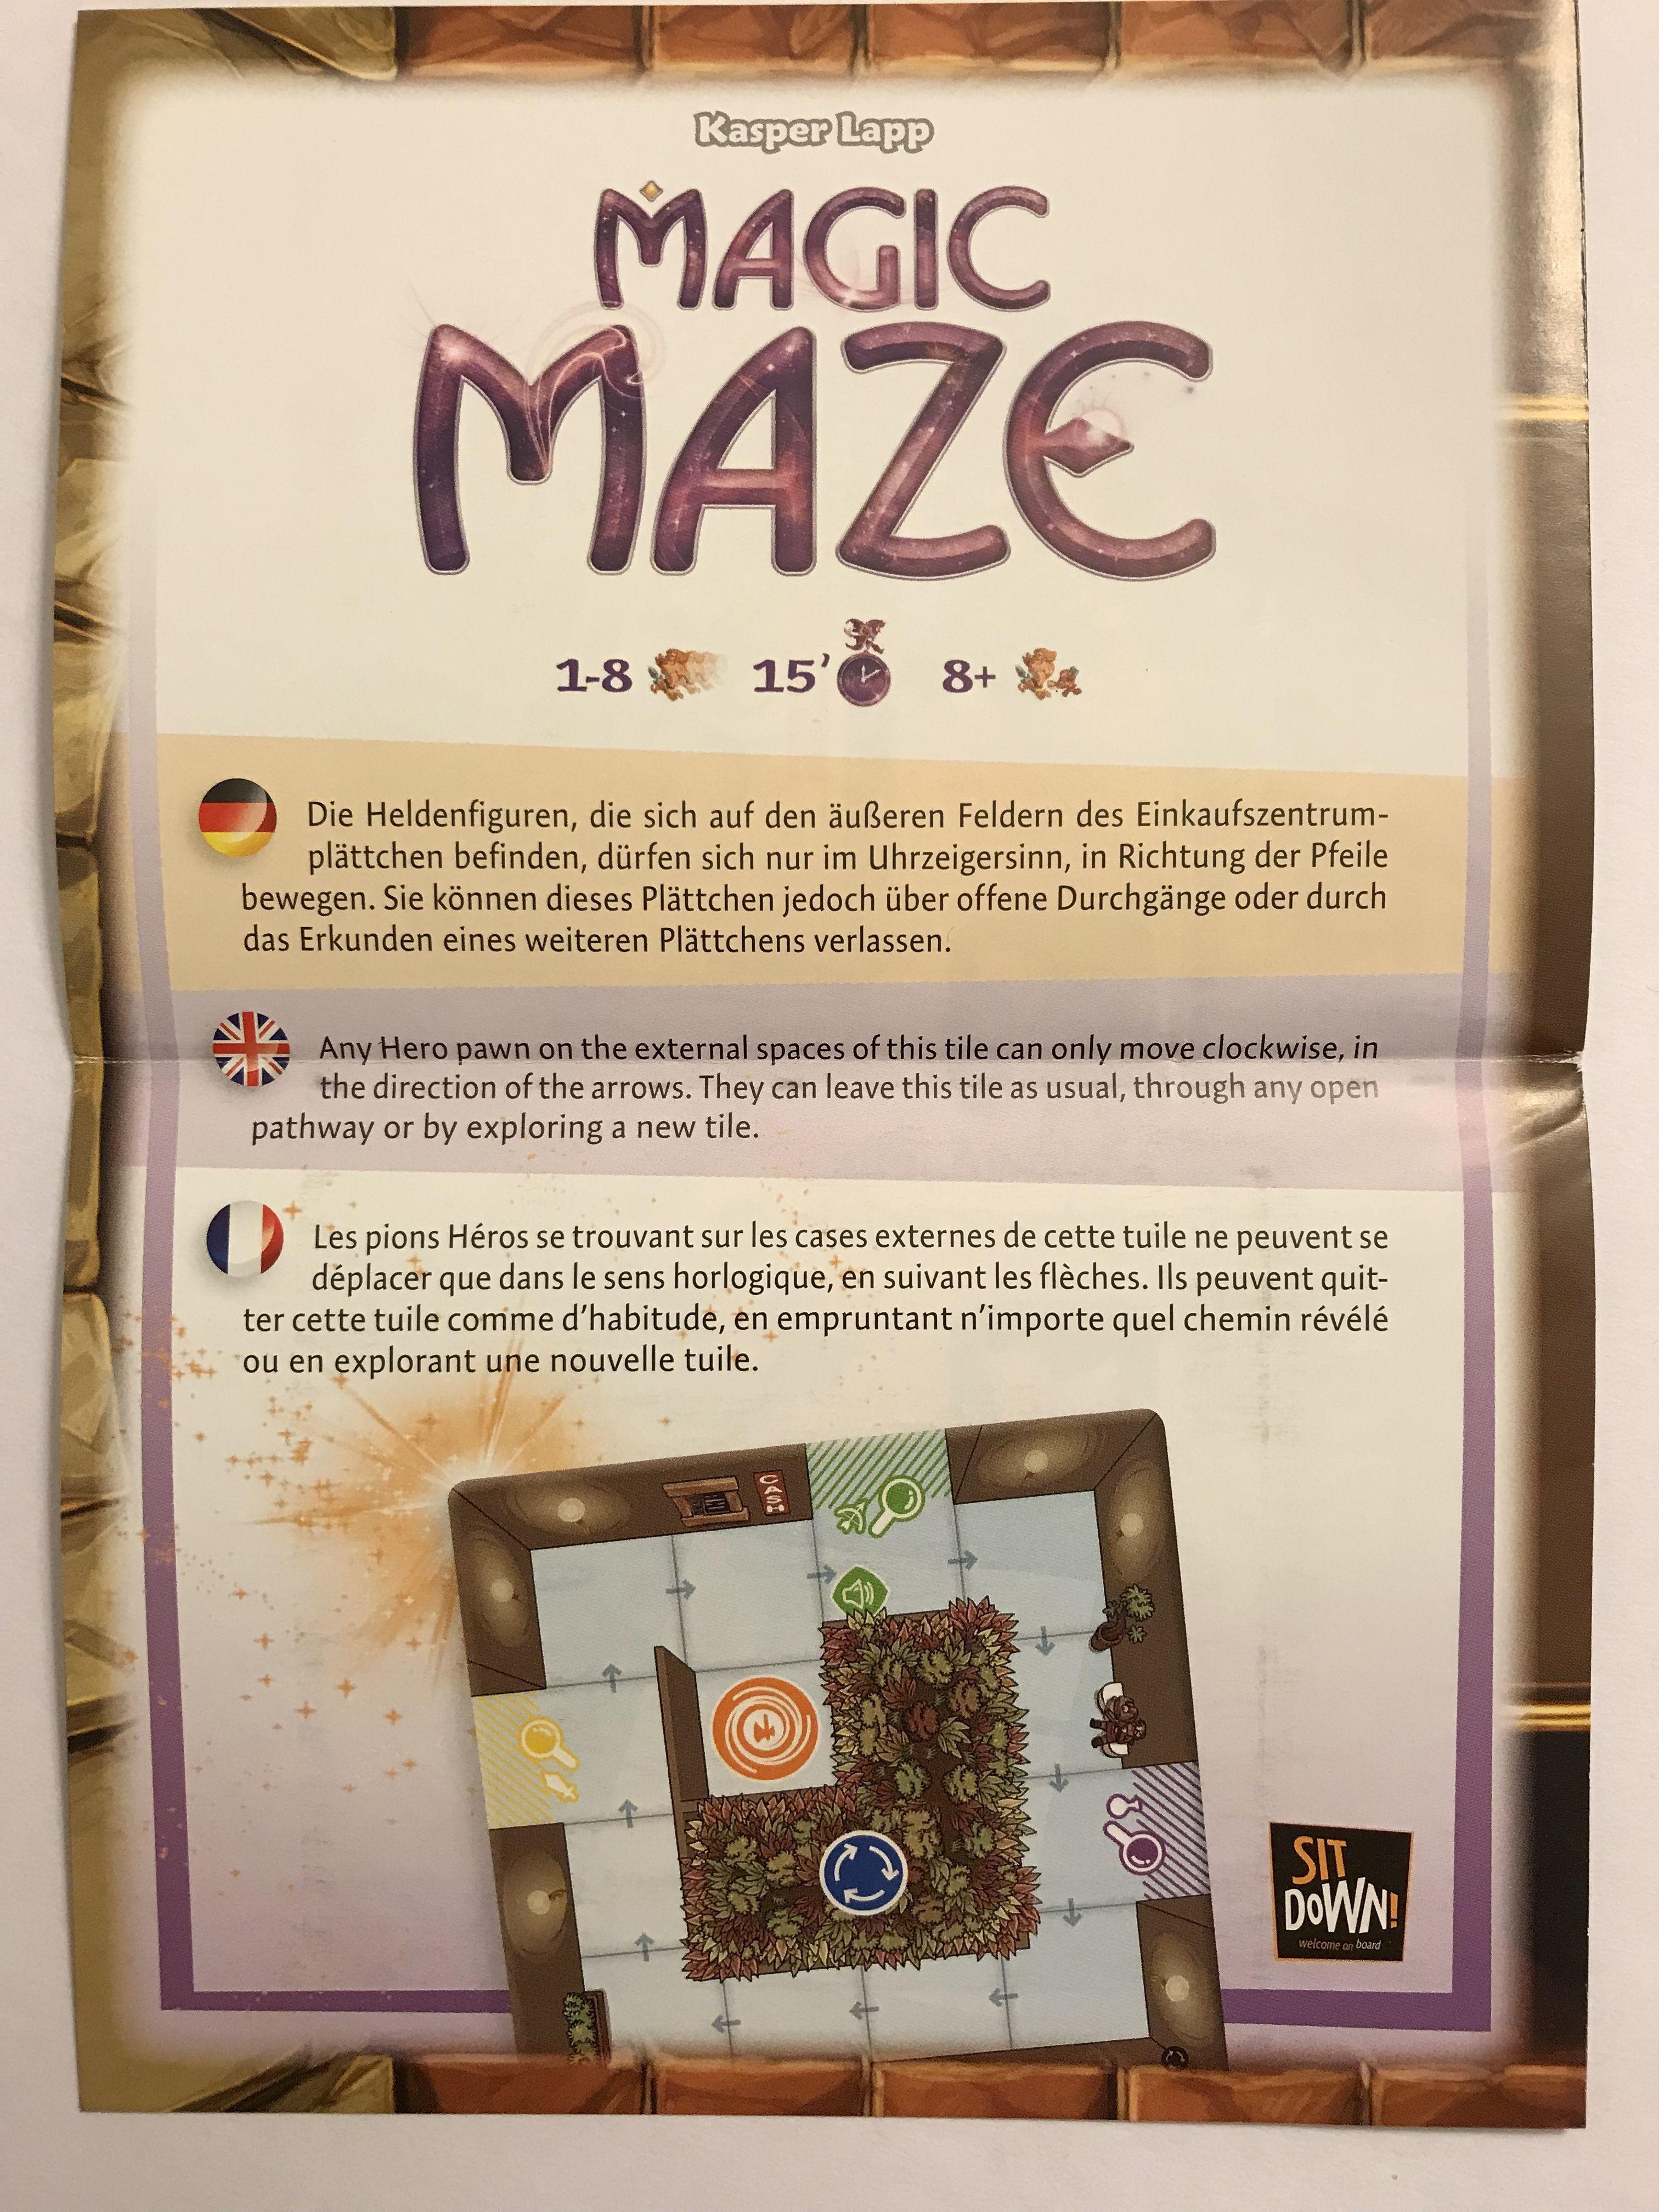 Magic Maze: Brettspiel Adventskalender 2017 Promo